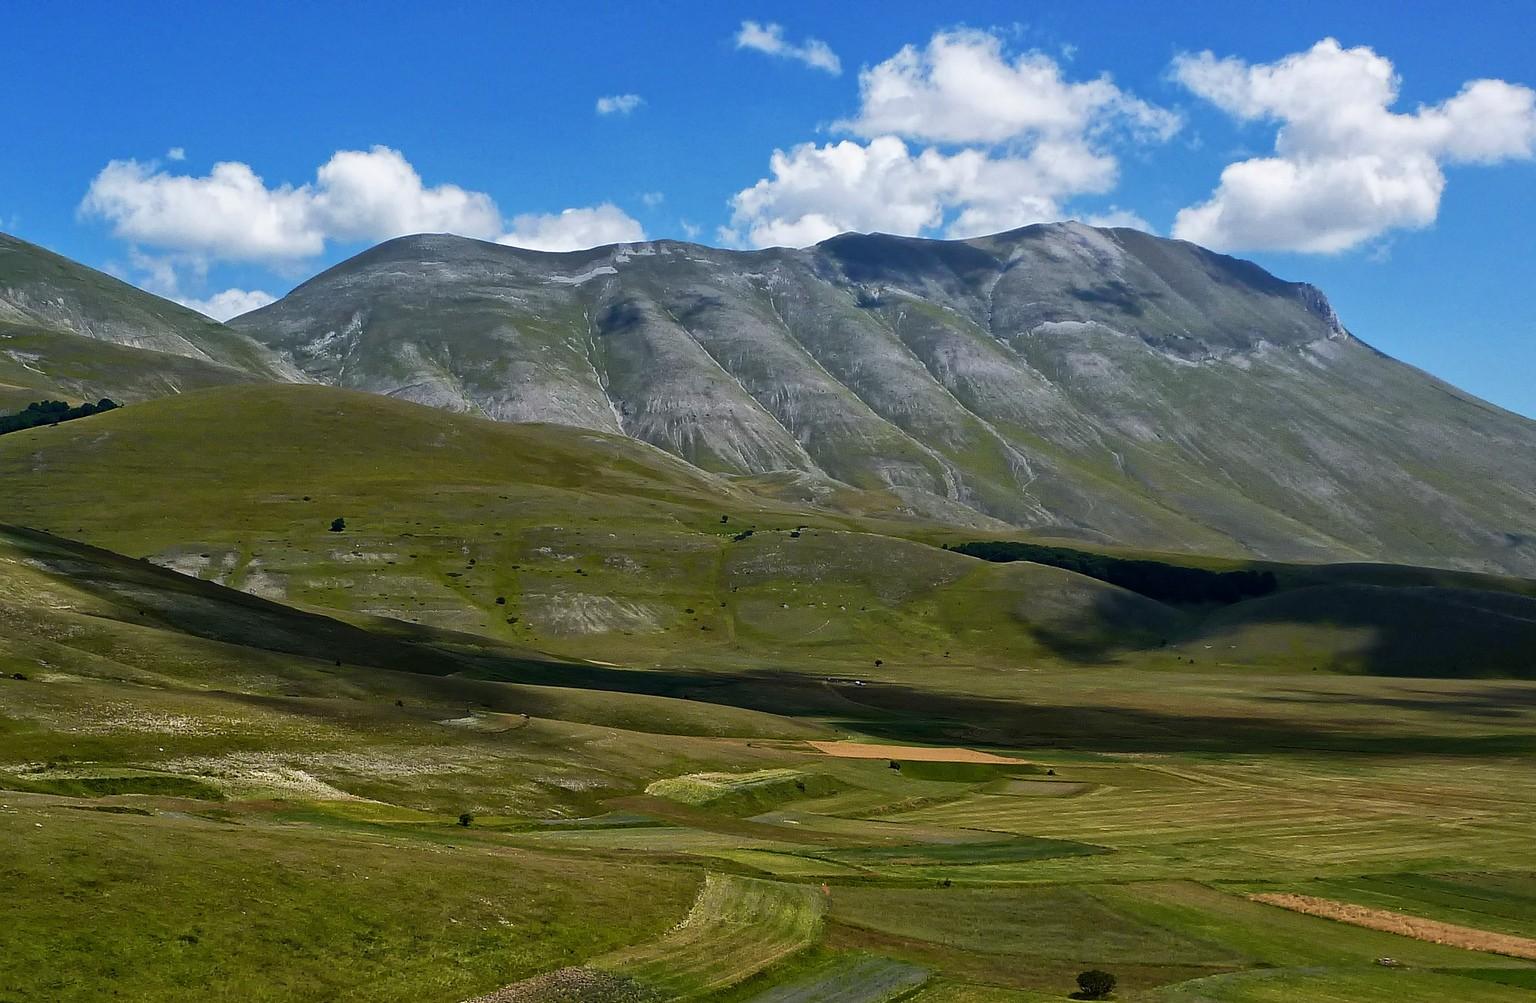 Week-end by Mountain bike on Sibillini Mountains